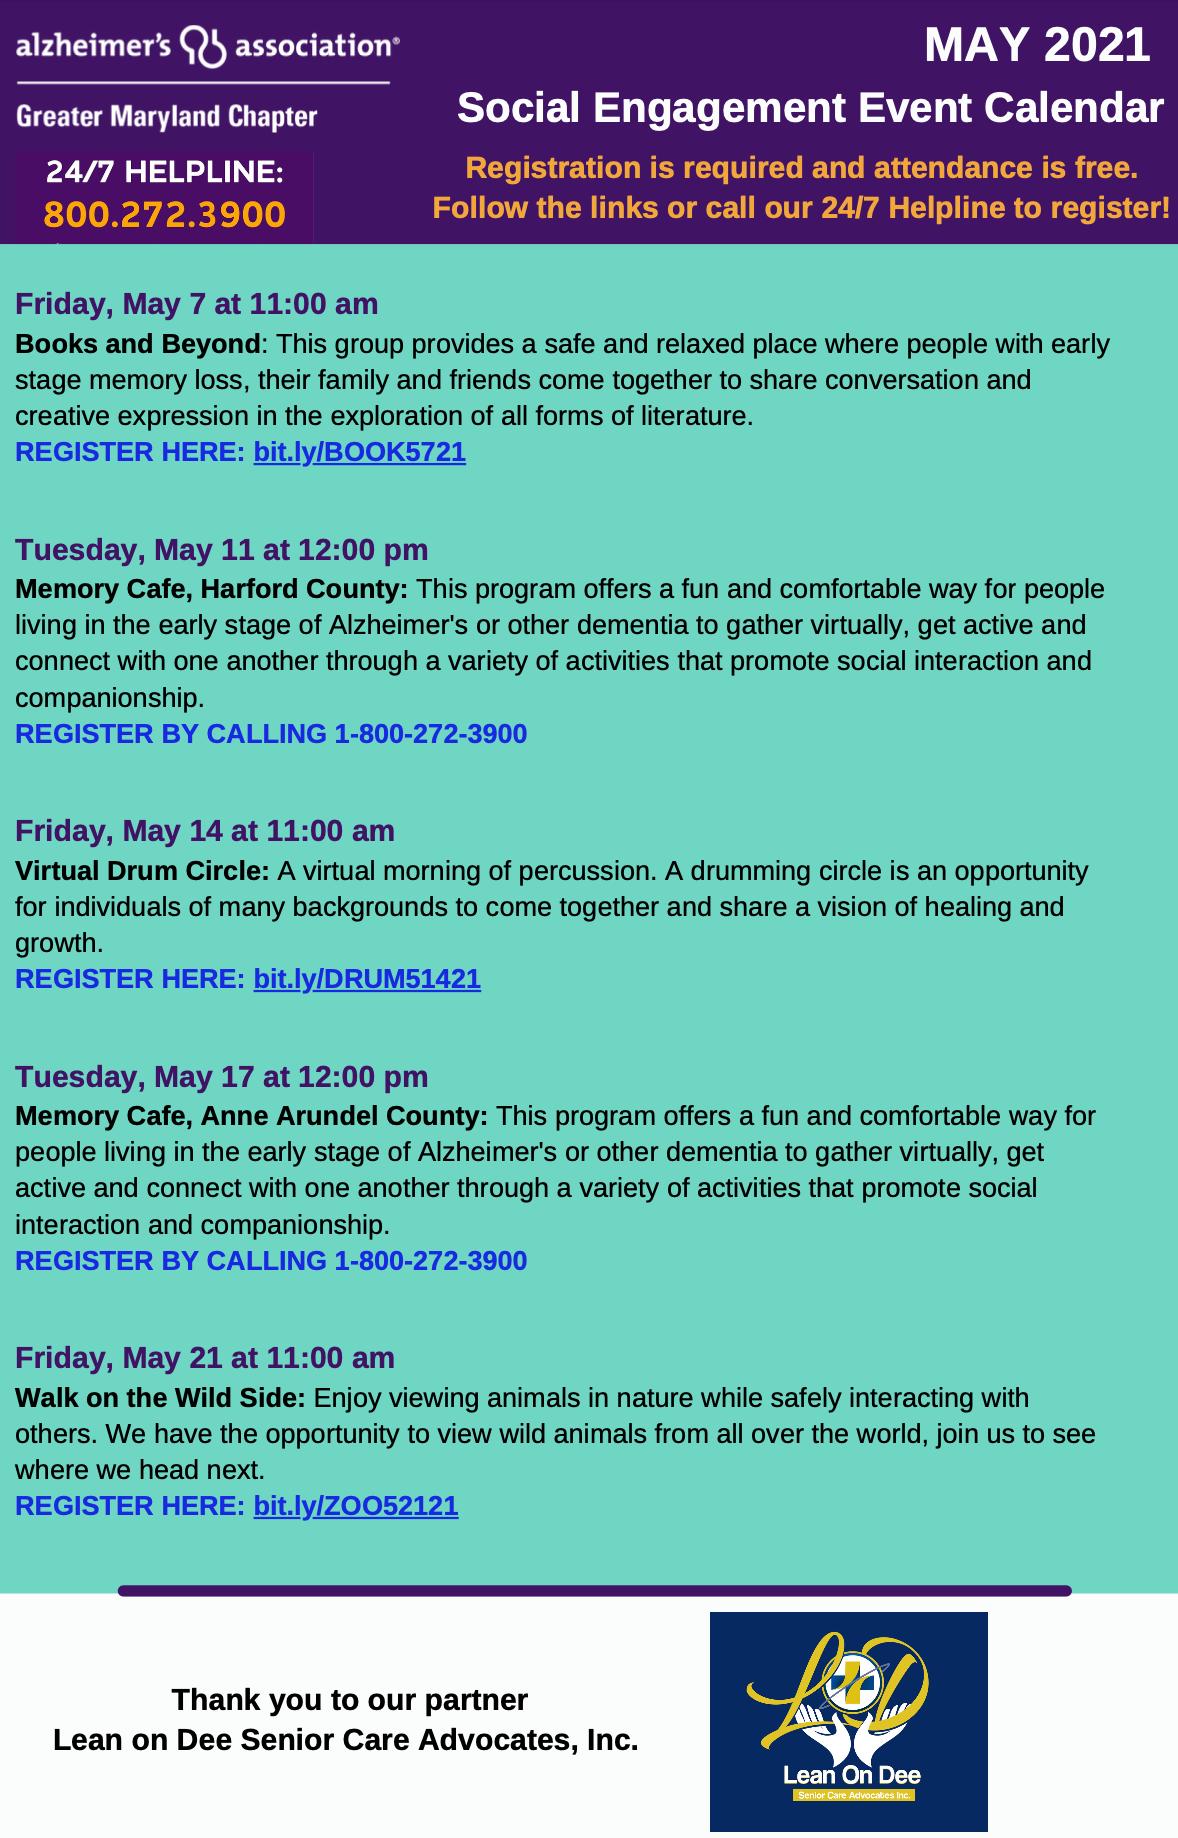 Social Engagement Event Calendar For May From Alzheimer's Association